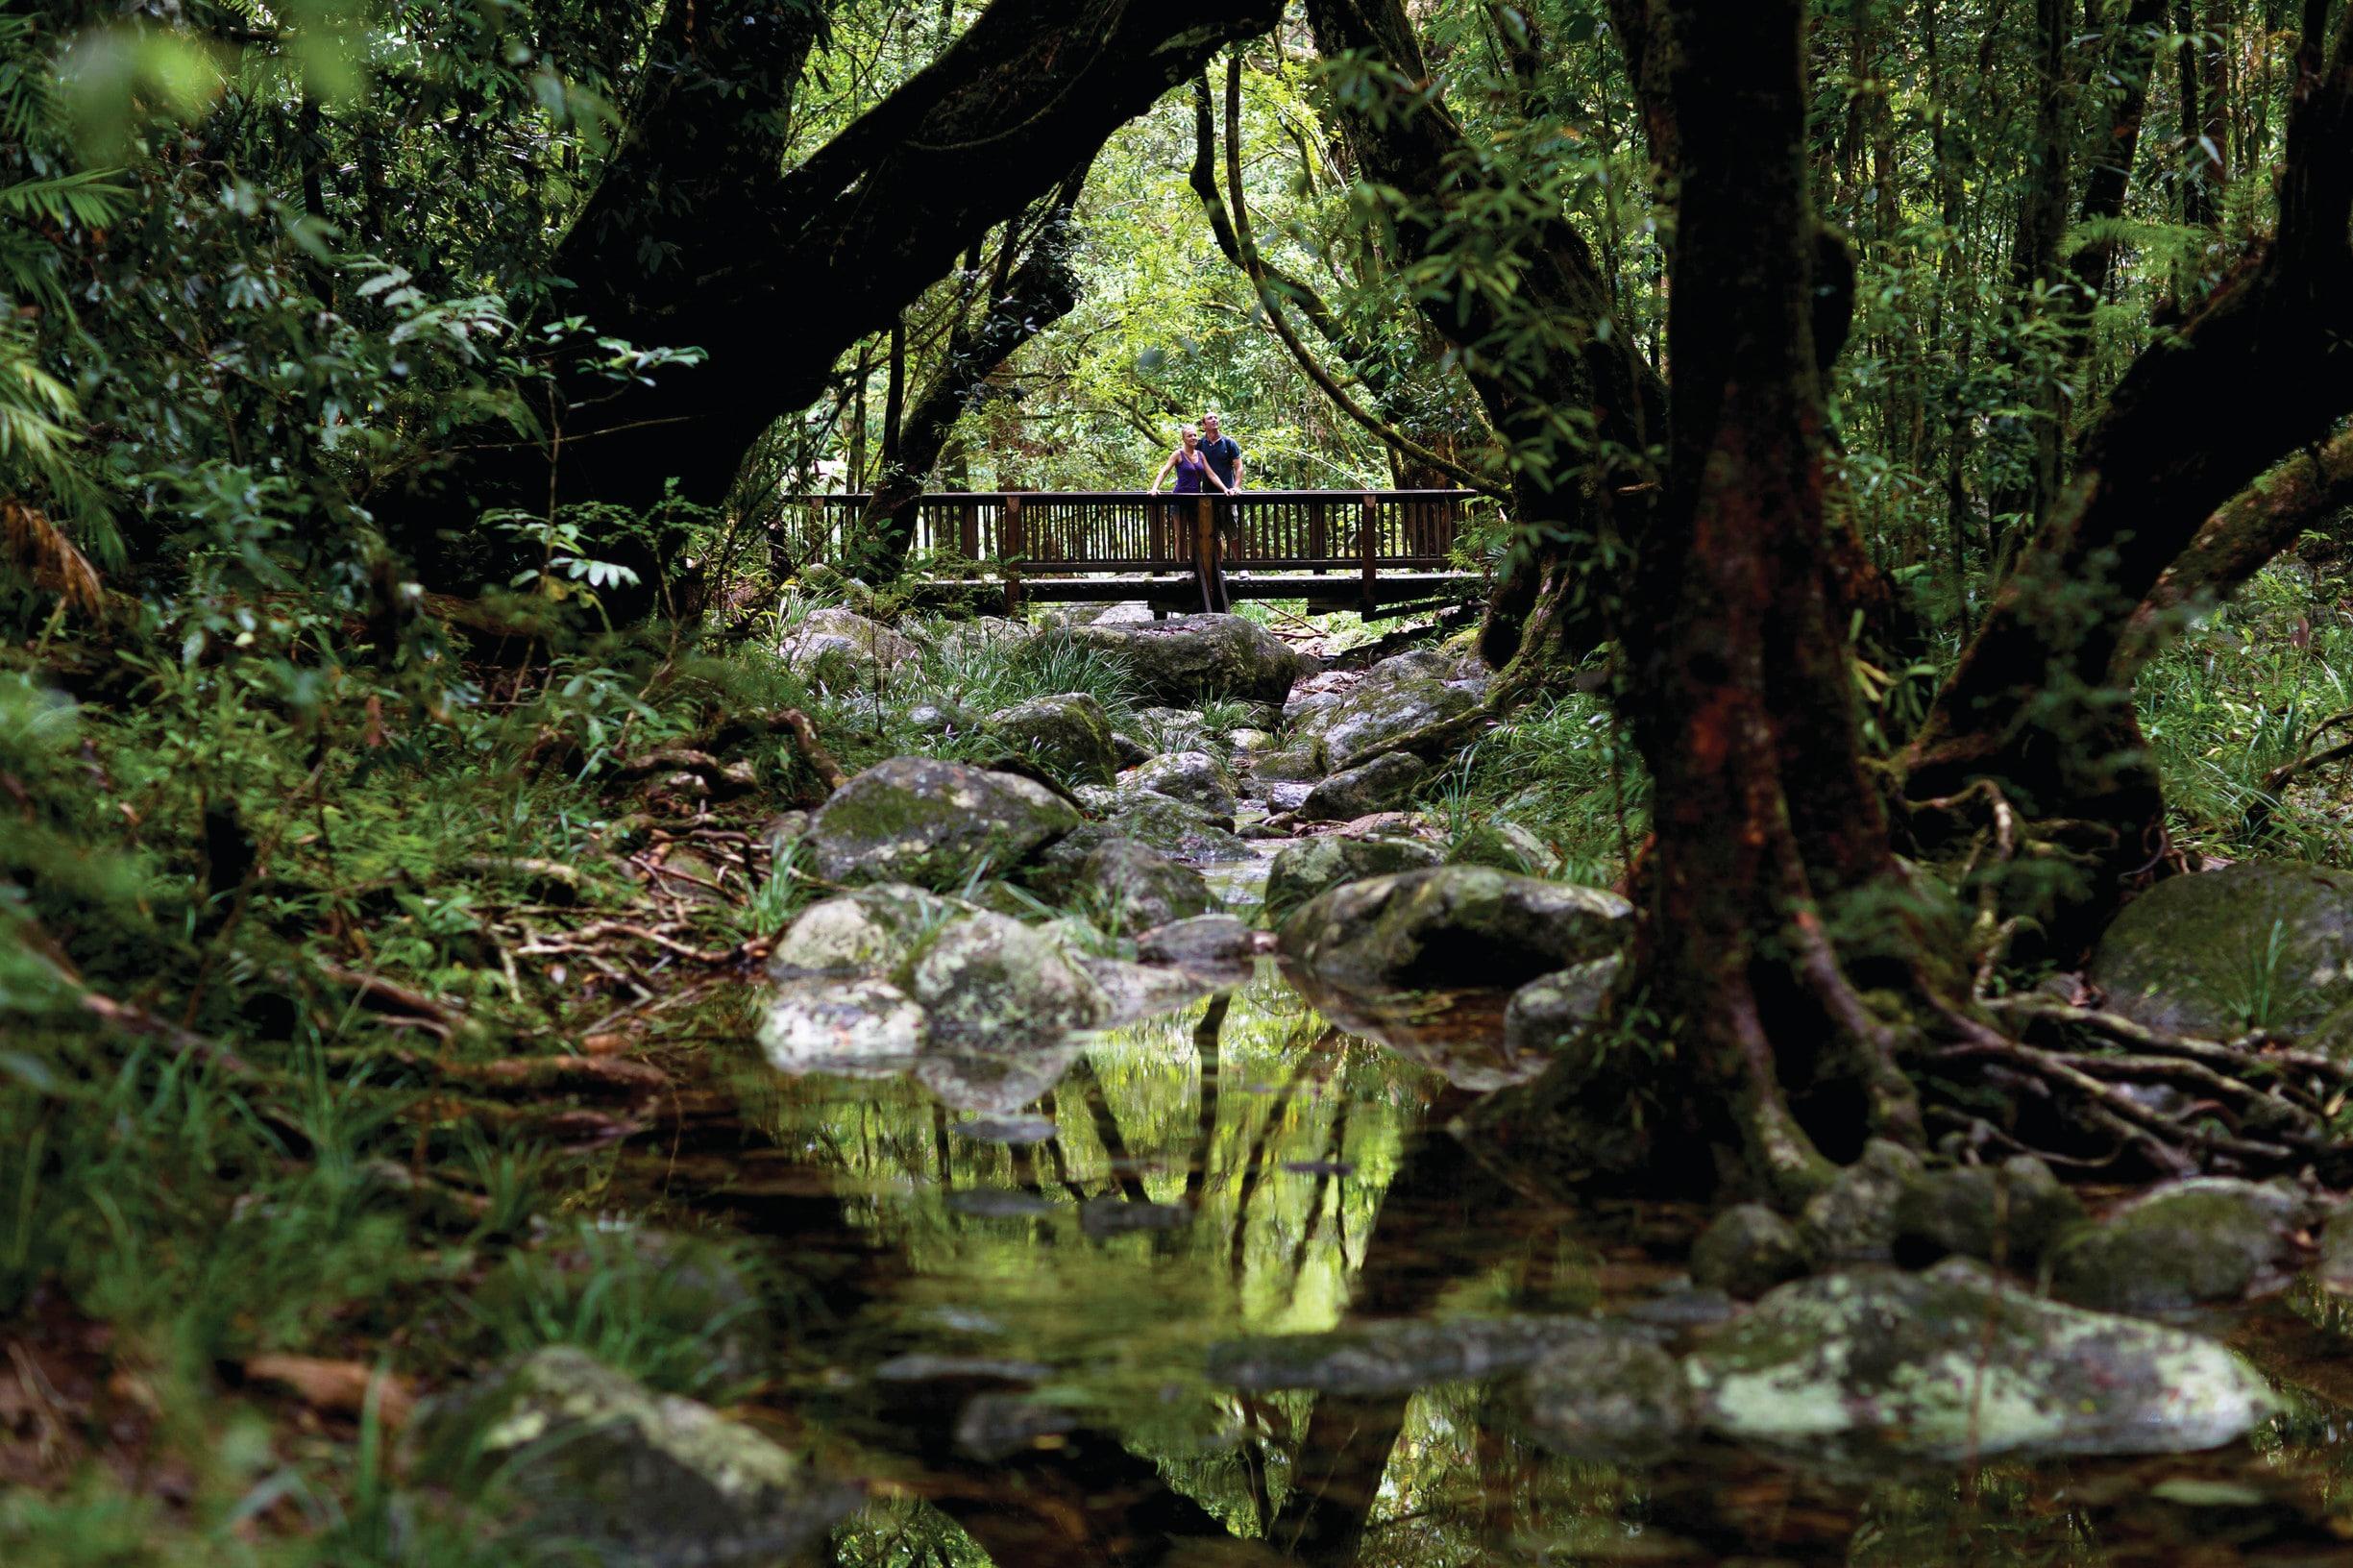 Guide to the Daintree Rainforest - Tourism Australia